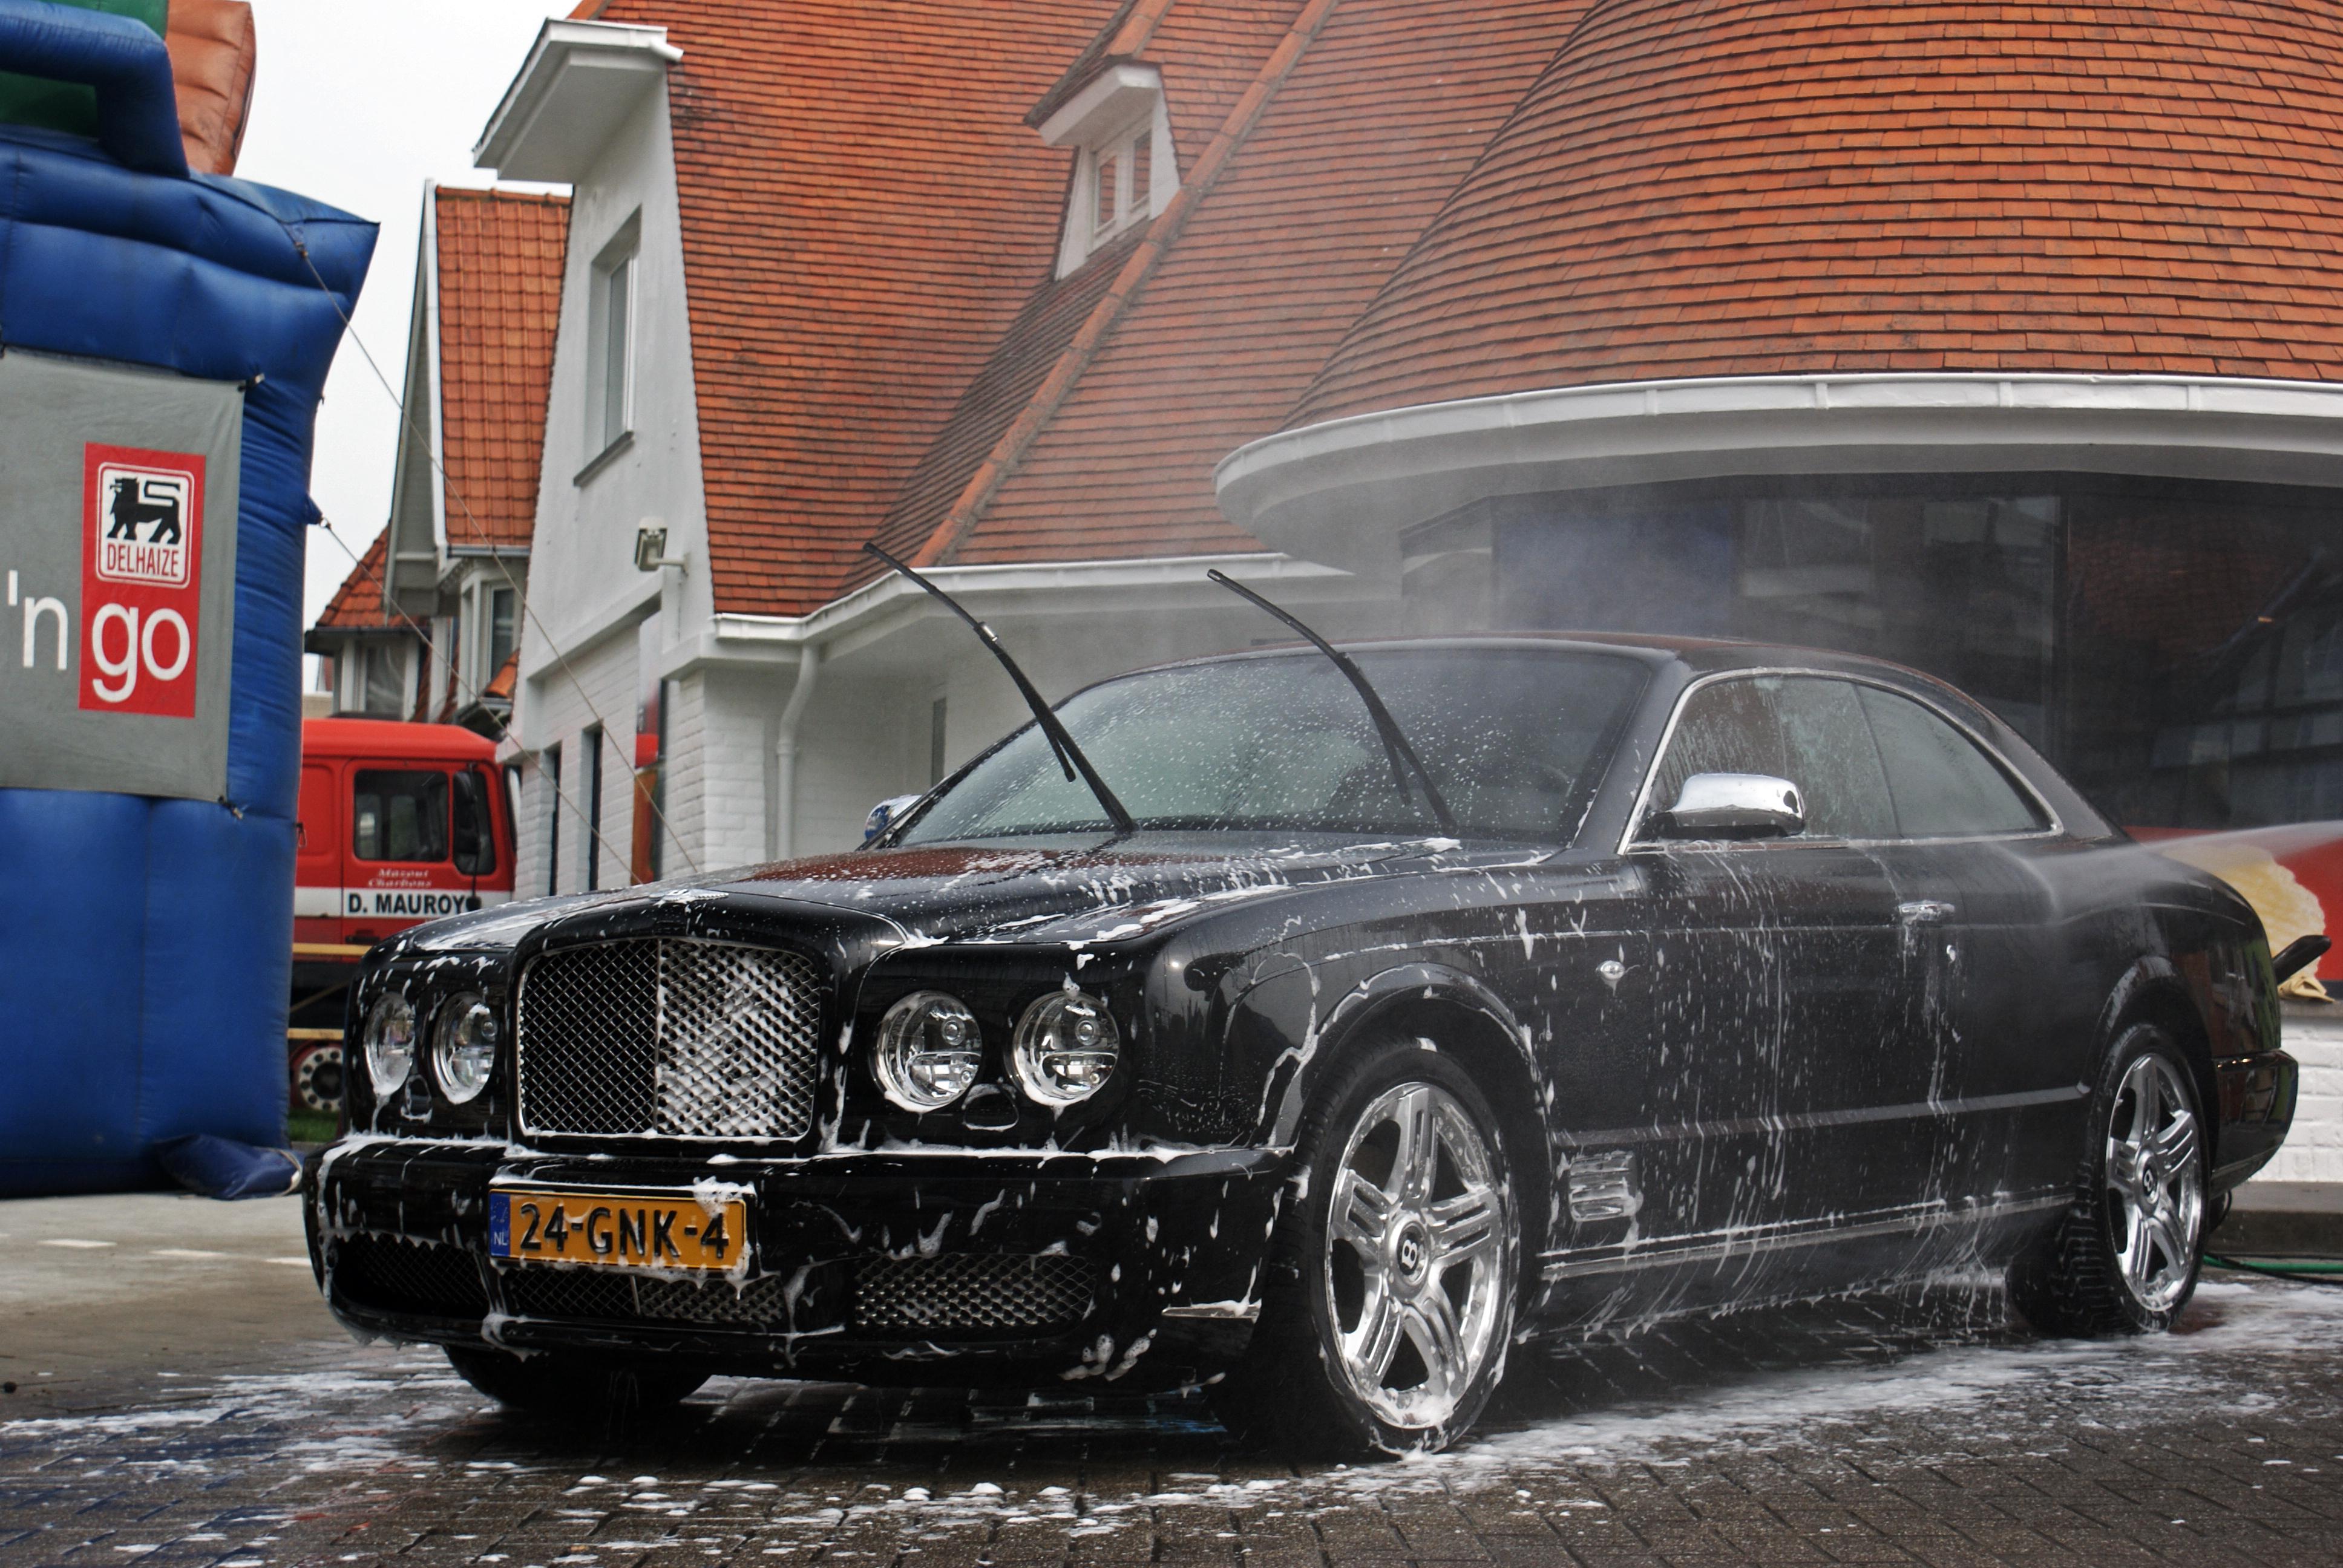 Wallpaper Car Race Carwash Knokke Rare Exclusive V8 Bentley